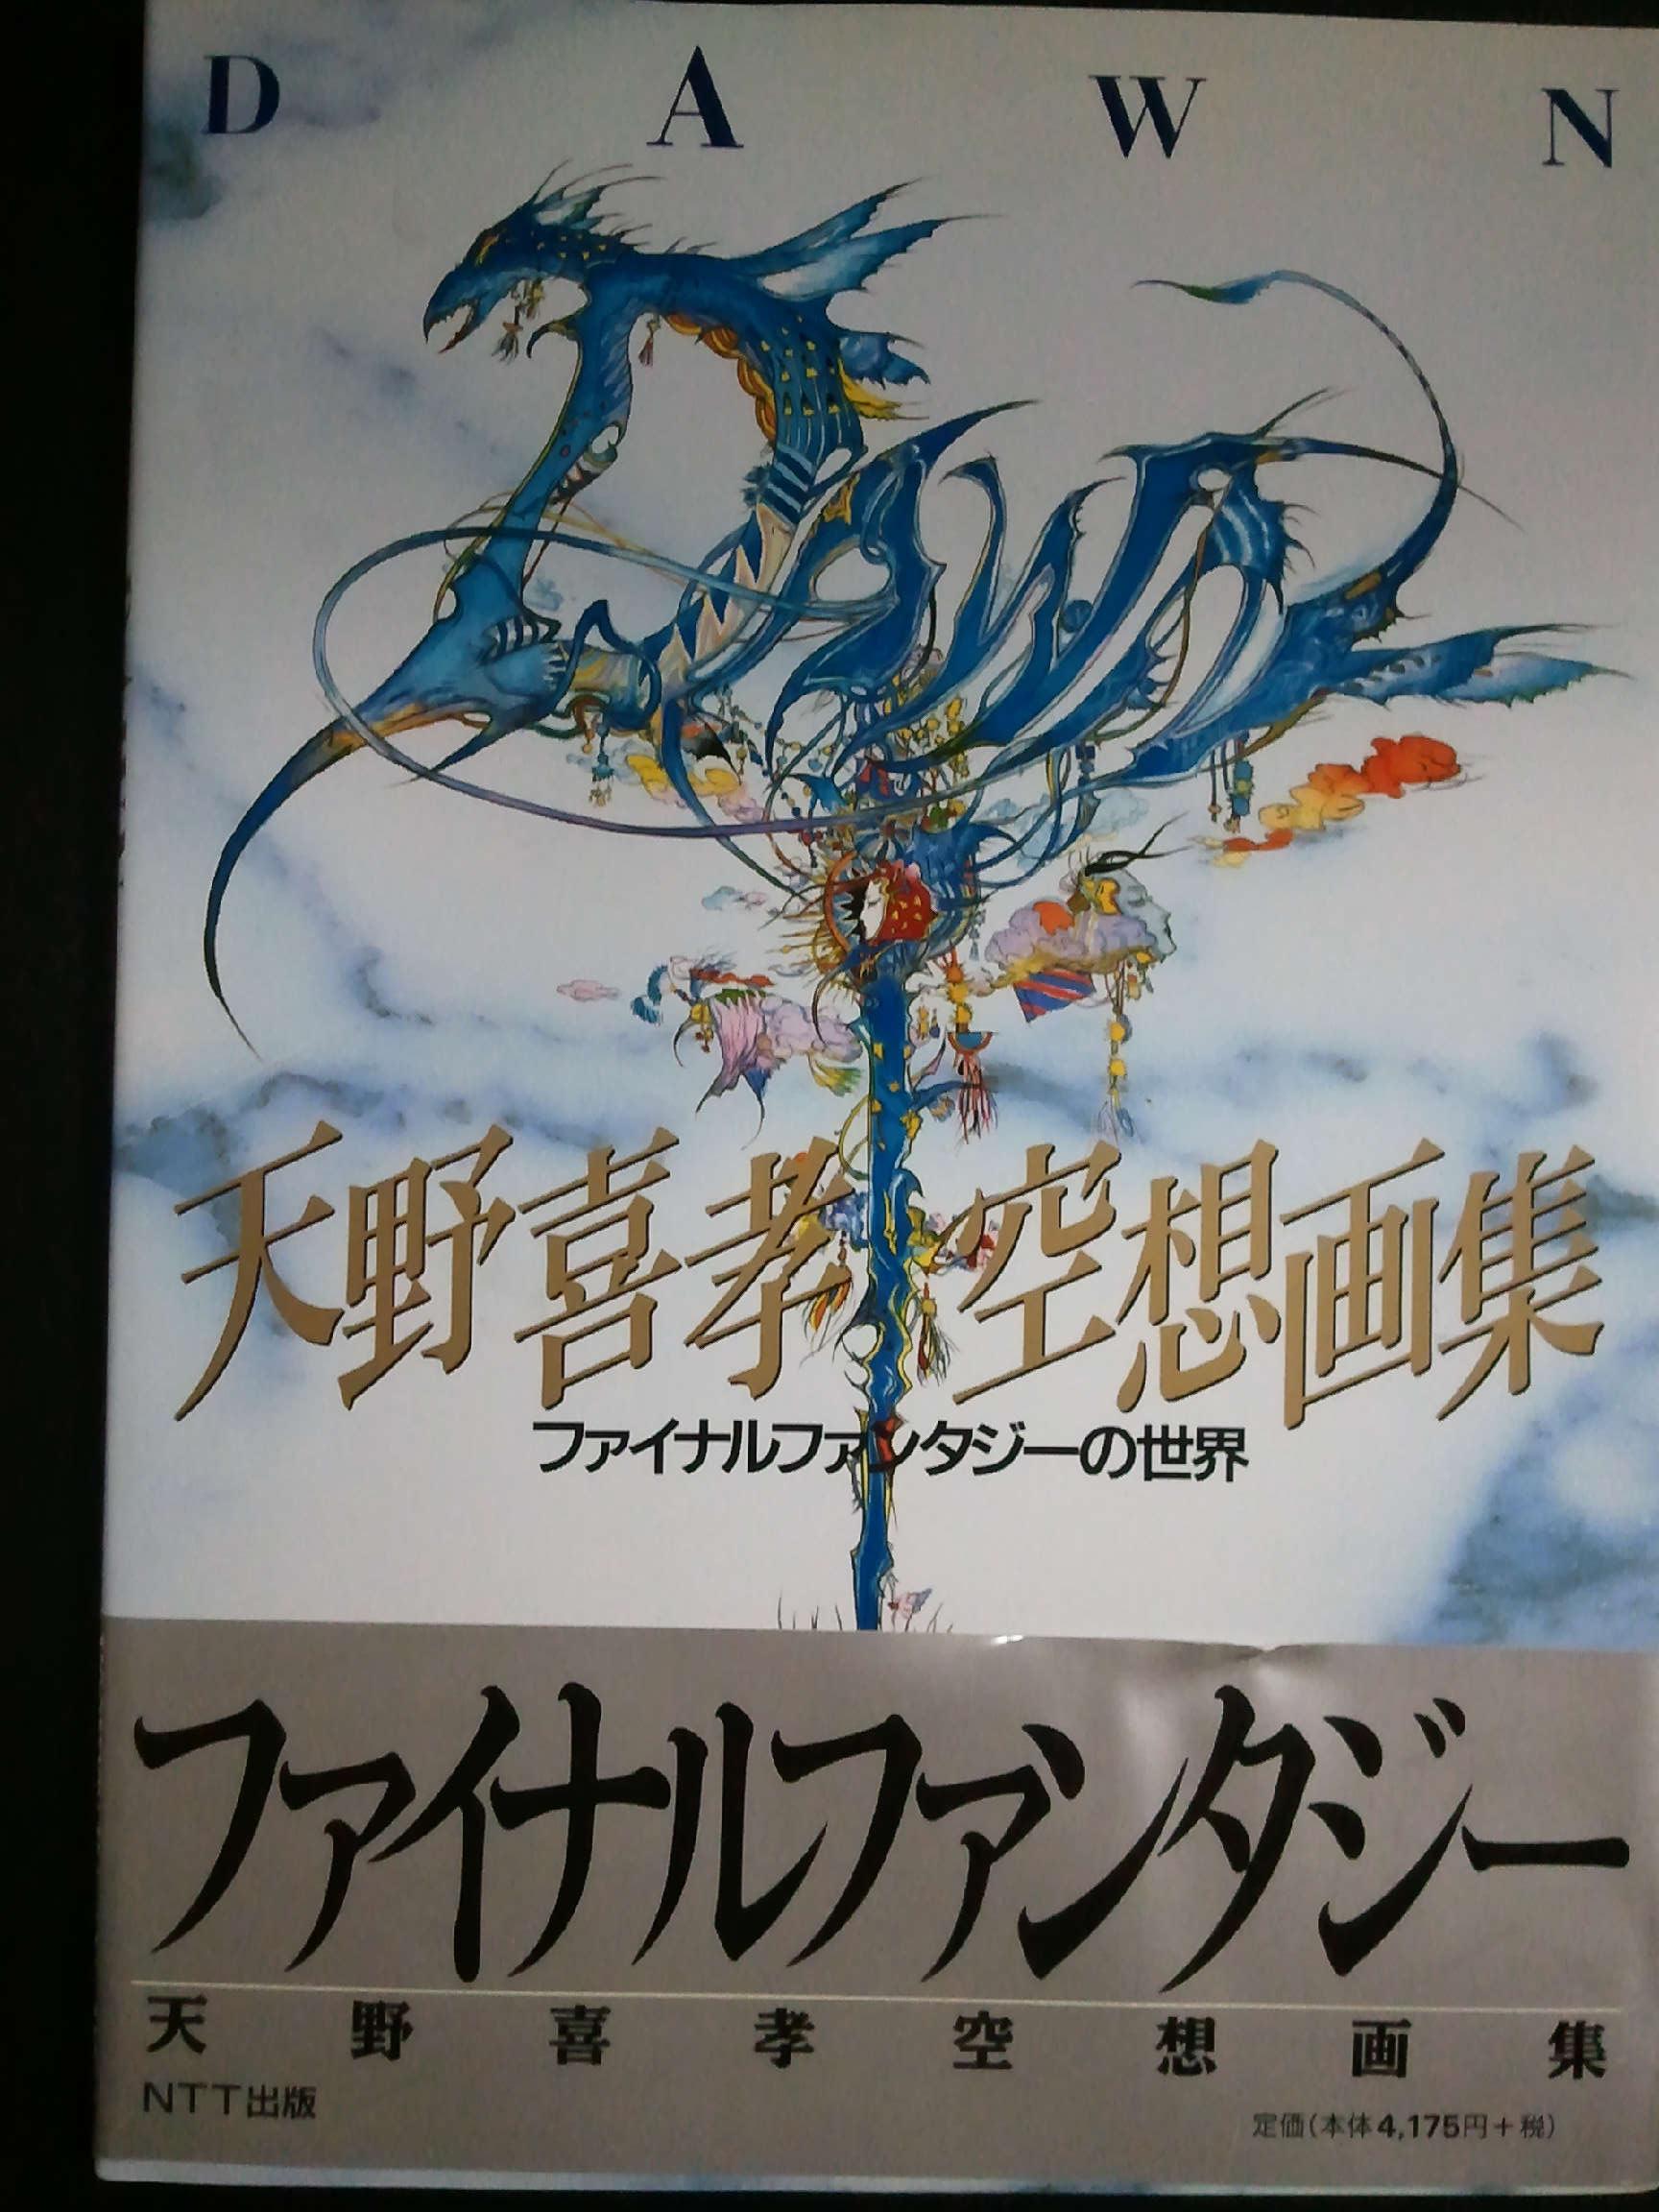 DAWN―天野喜孝空想画集 ファイナルファンタジーの世界